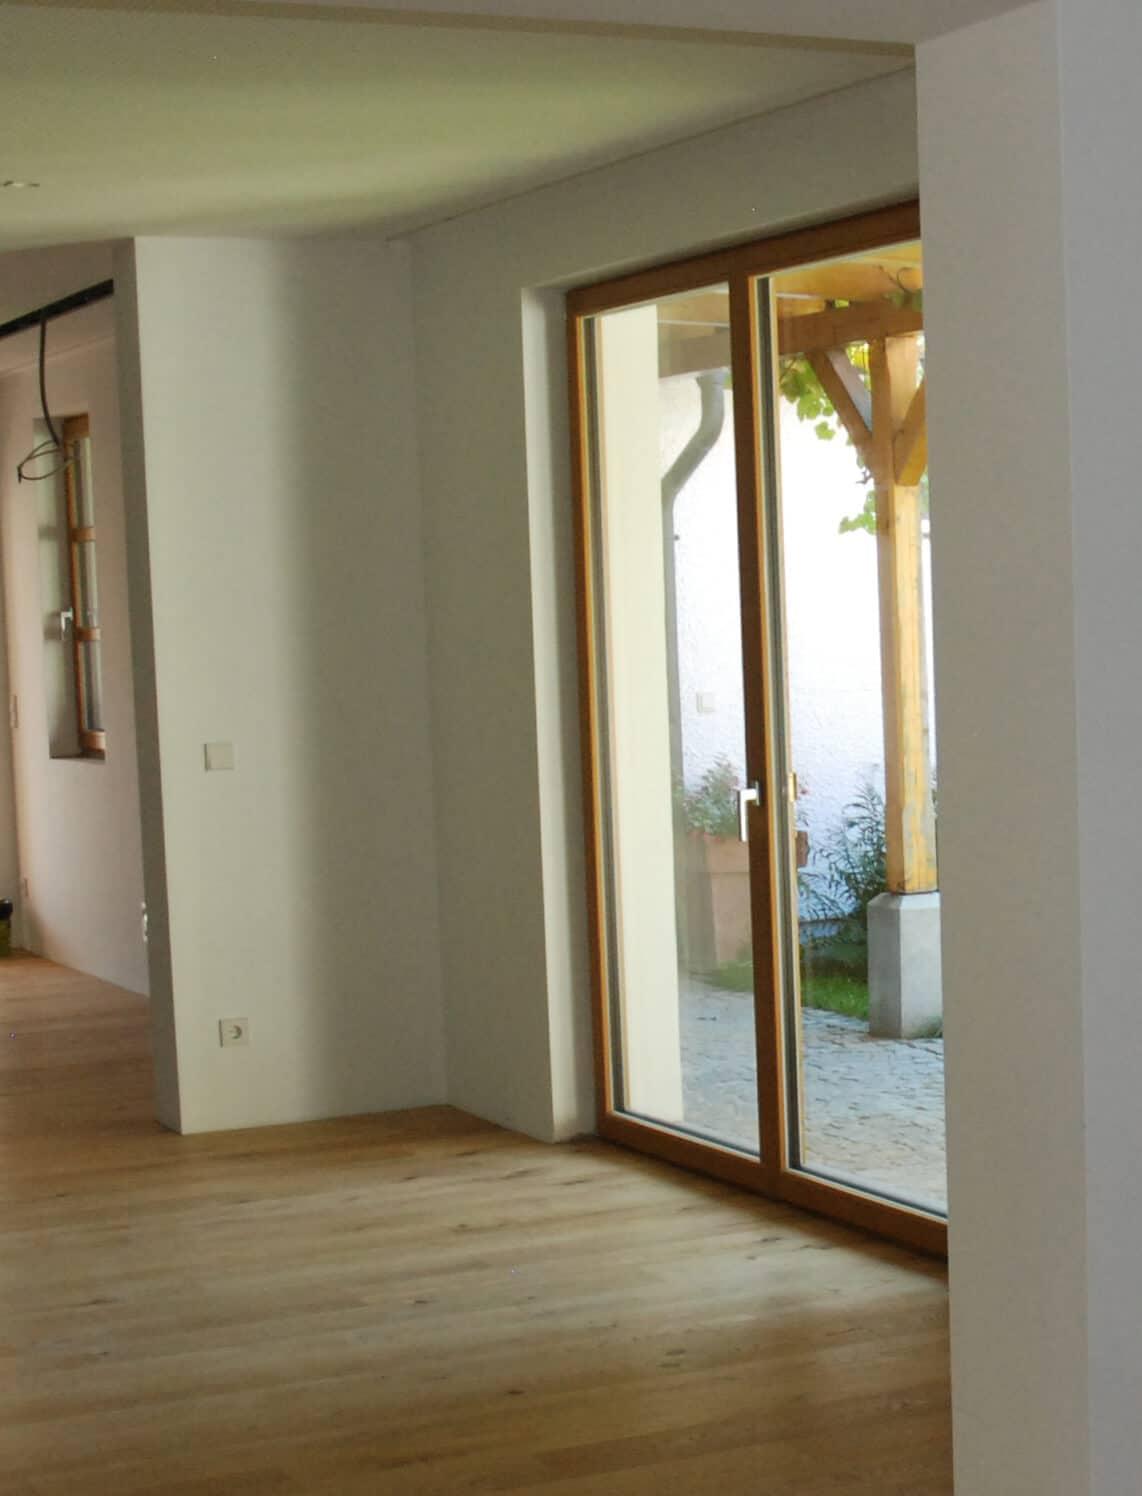 Balkontüre 2-flügelig aus Holz